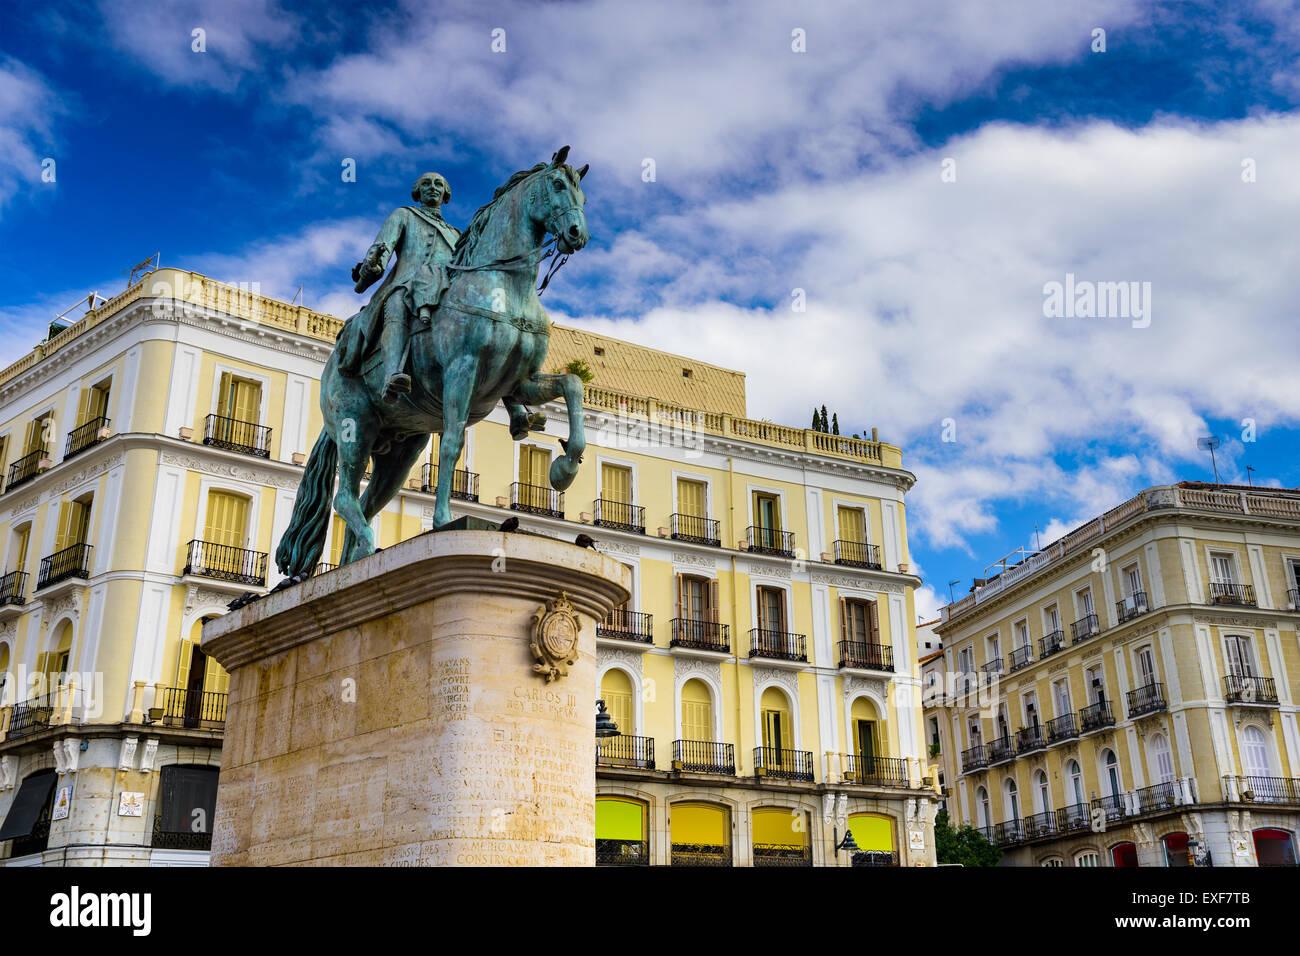 Madrid, Espagne à la statue équestre du roi Charles III à Puerta del Sol. Photo Stock